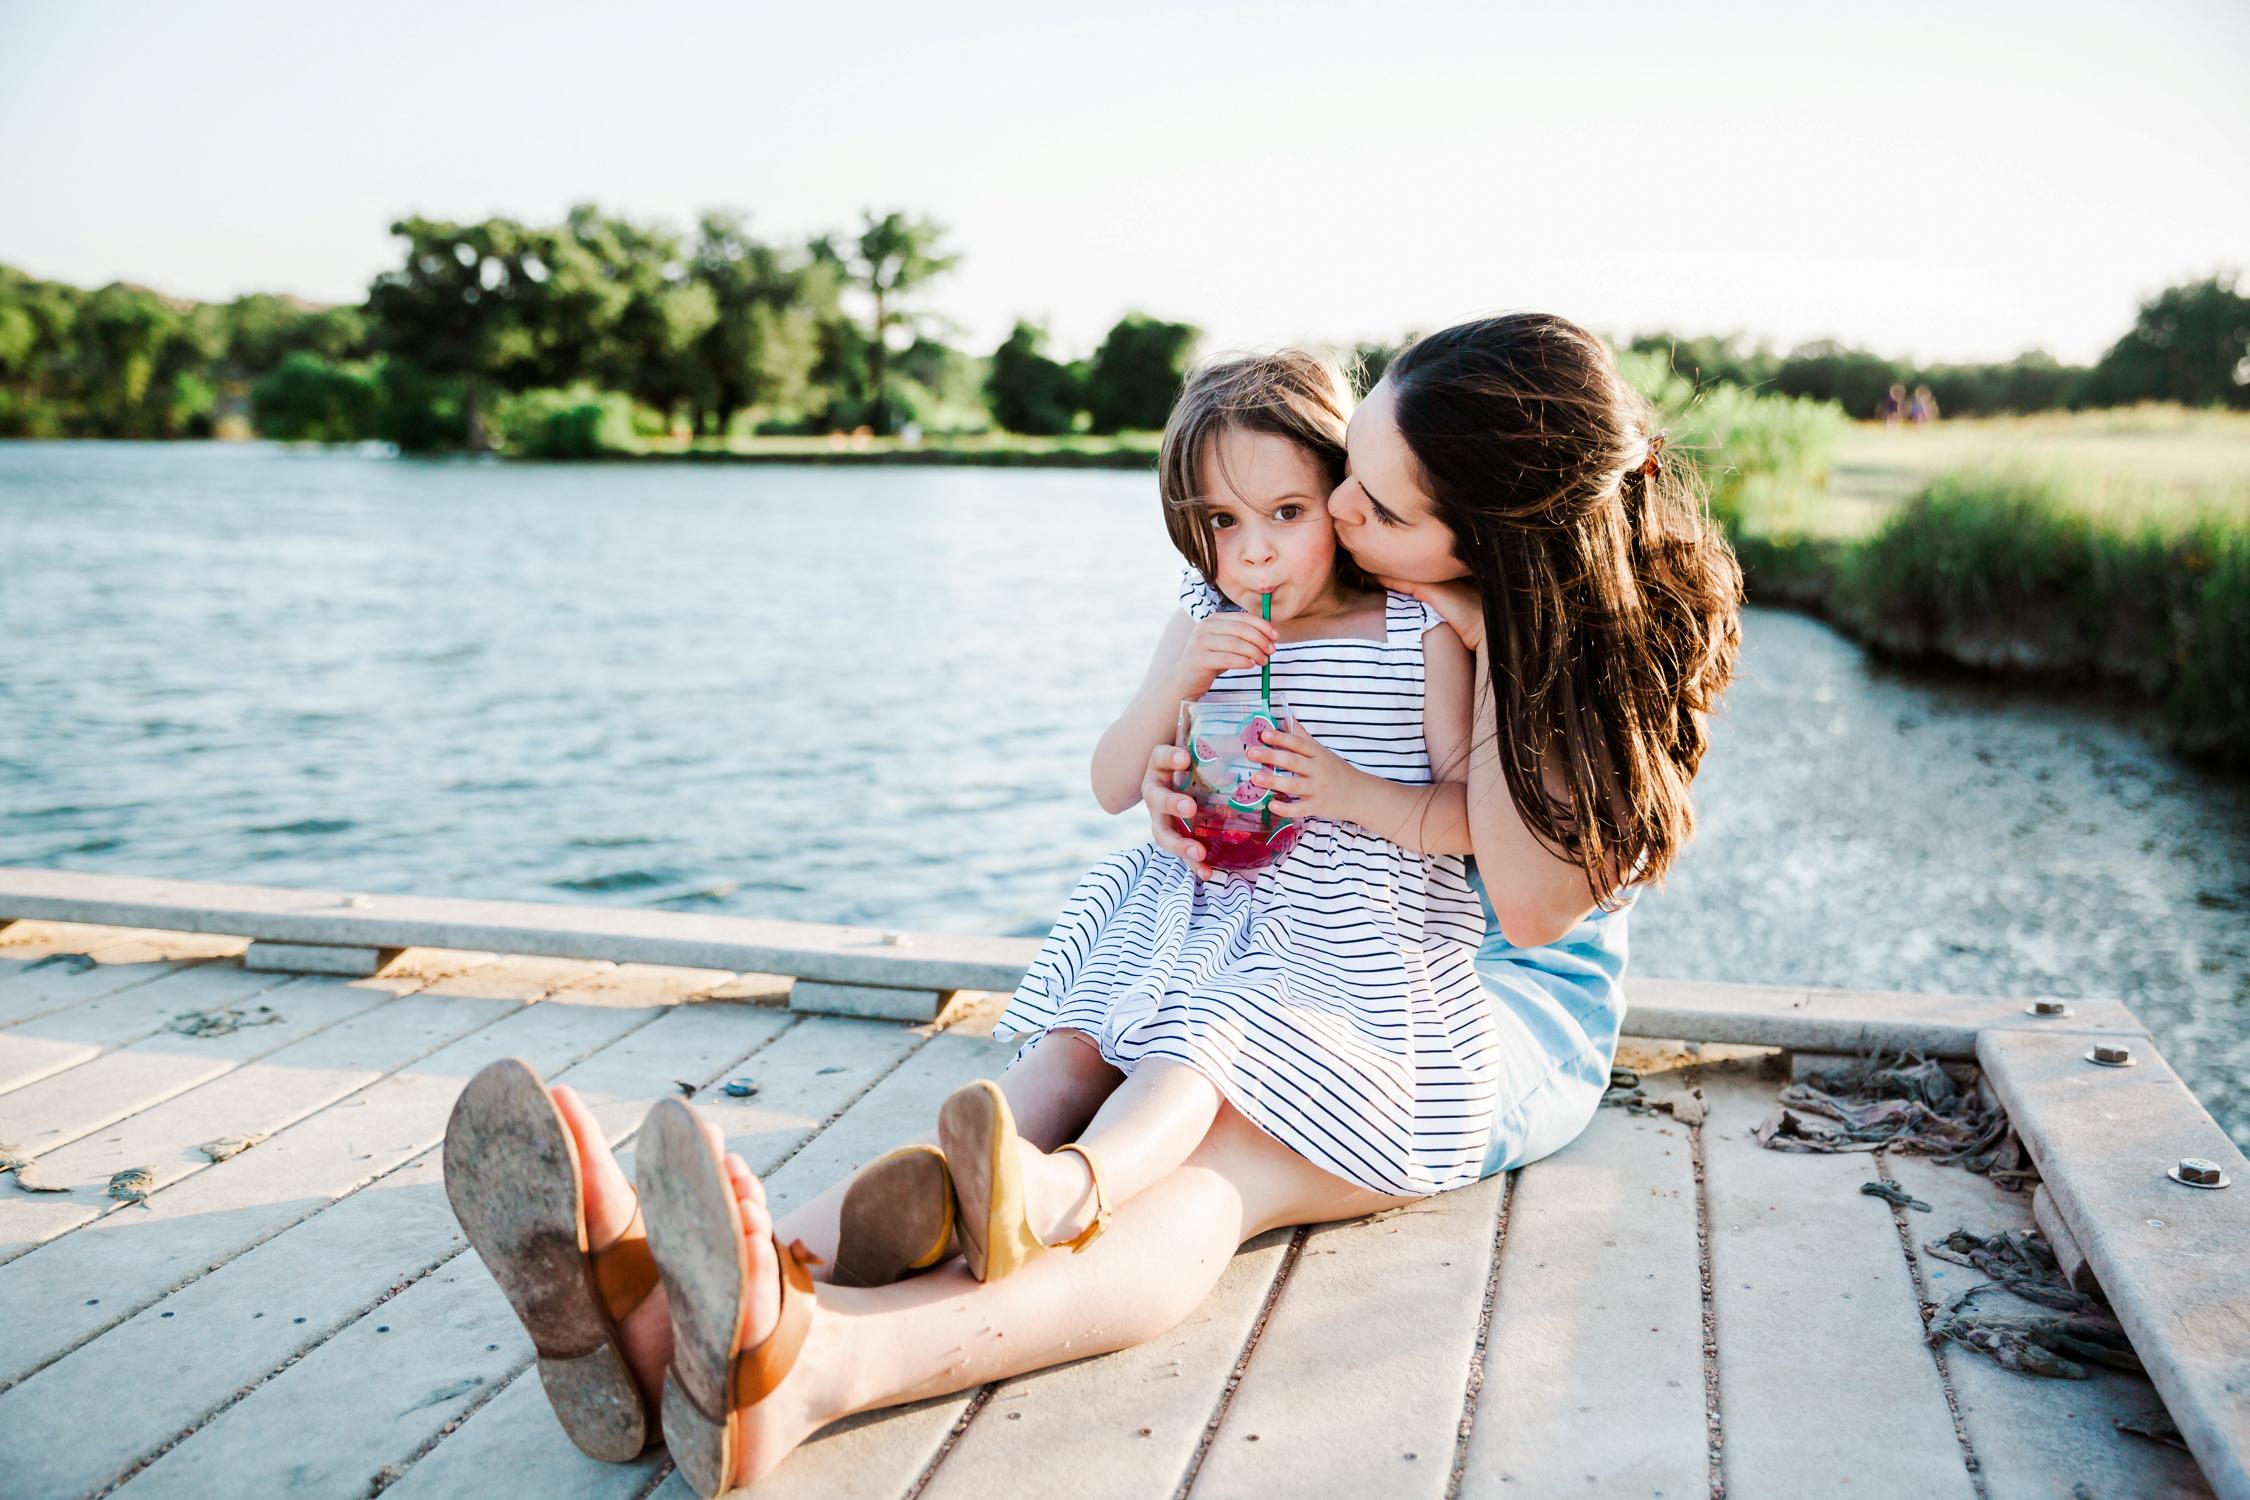 lifestyle-family-photographer-watermelon-summer-nashville-franklin-34.jpg